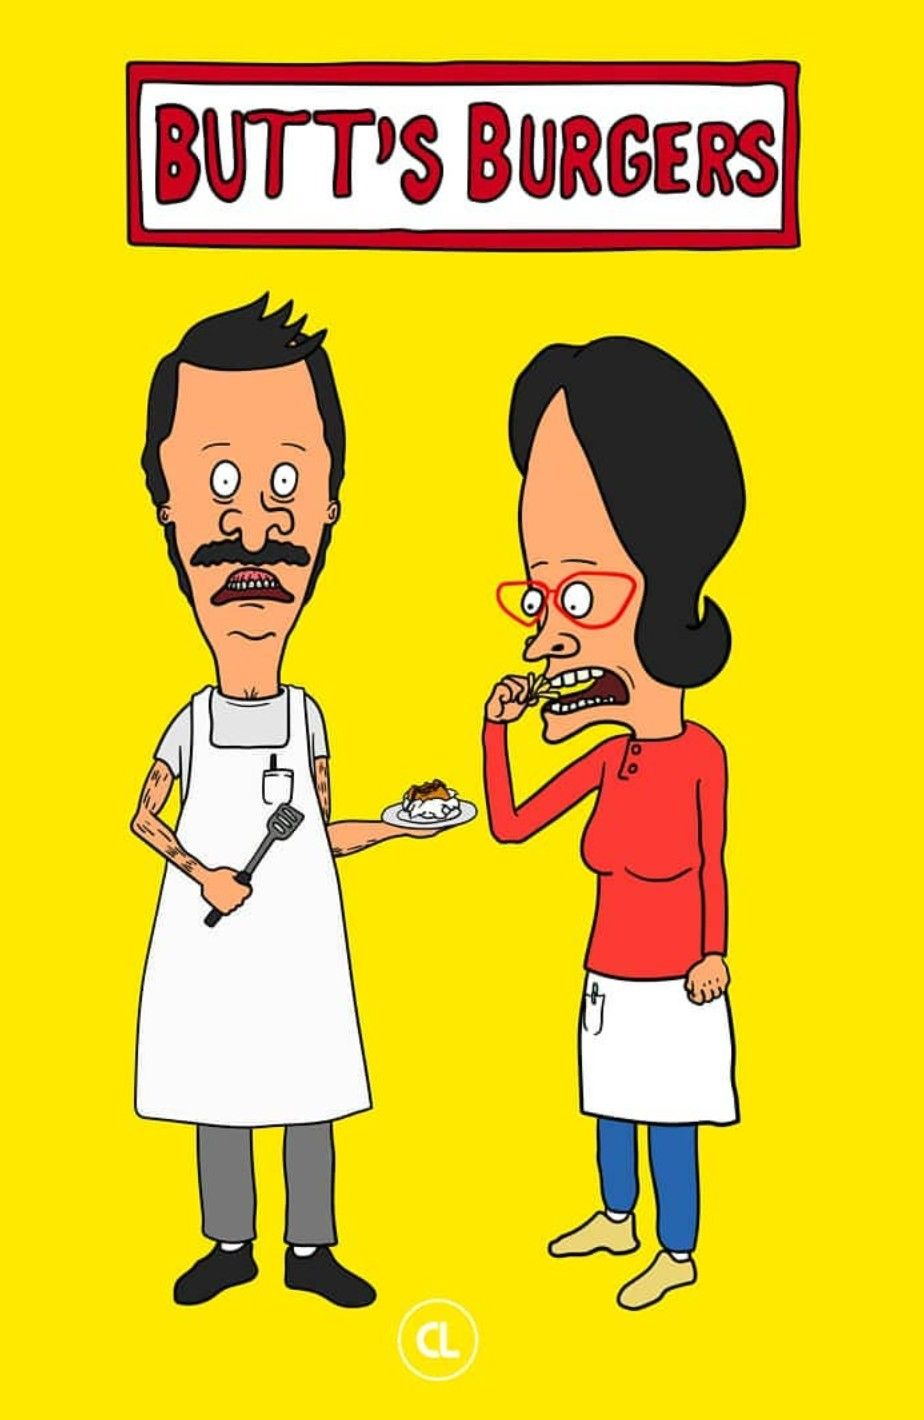 beavis & butthead x butt's burgers, bob's burgers | funny stuff